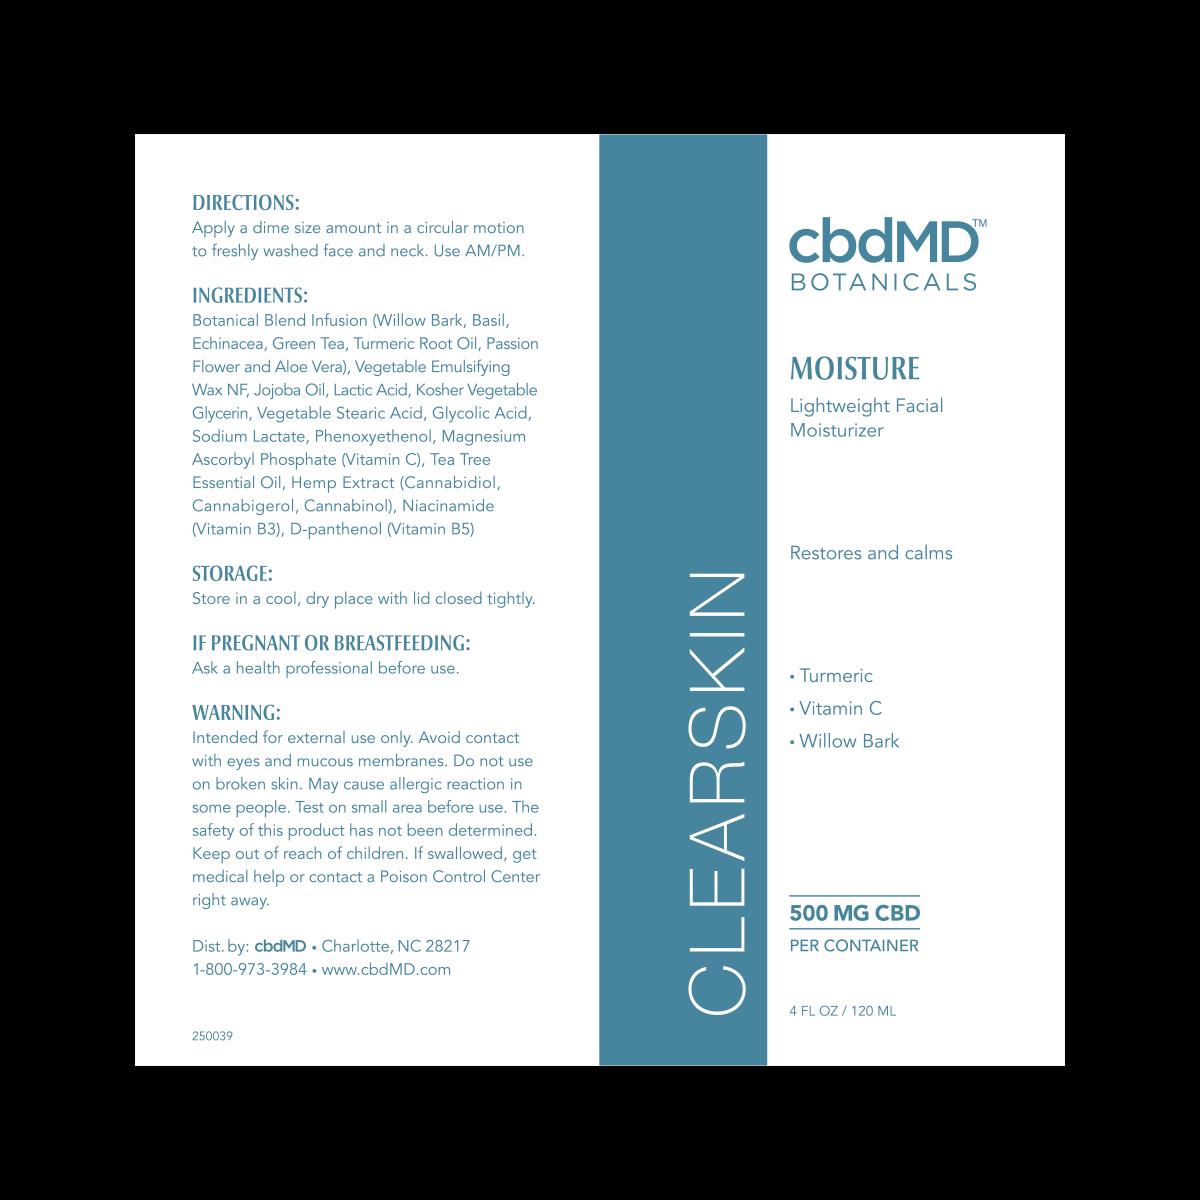 cbdMD | CBDmd | CBD CLEARSKIN MOISTURE | 500mg | 4 Oz TUBE |